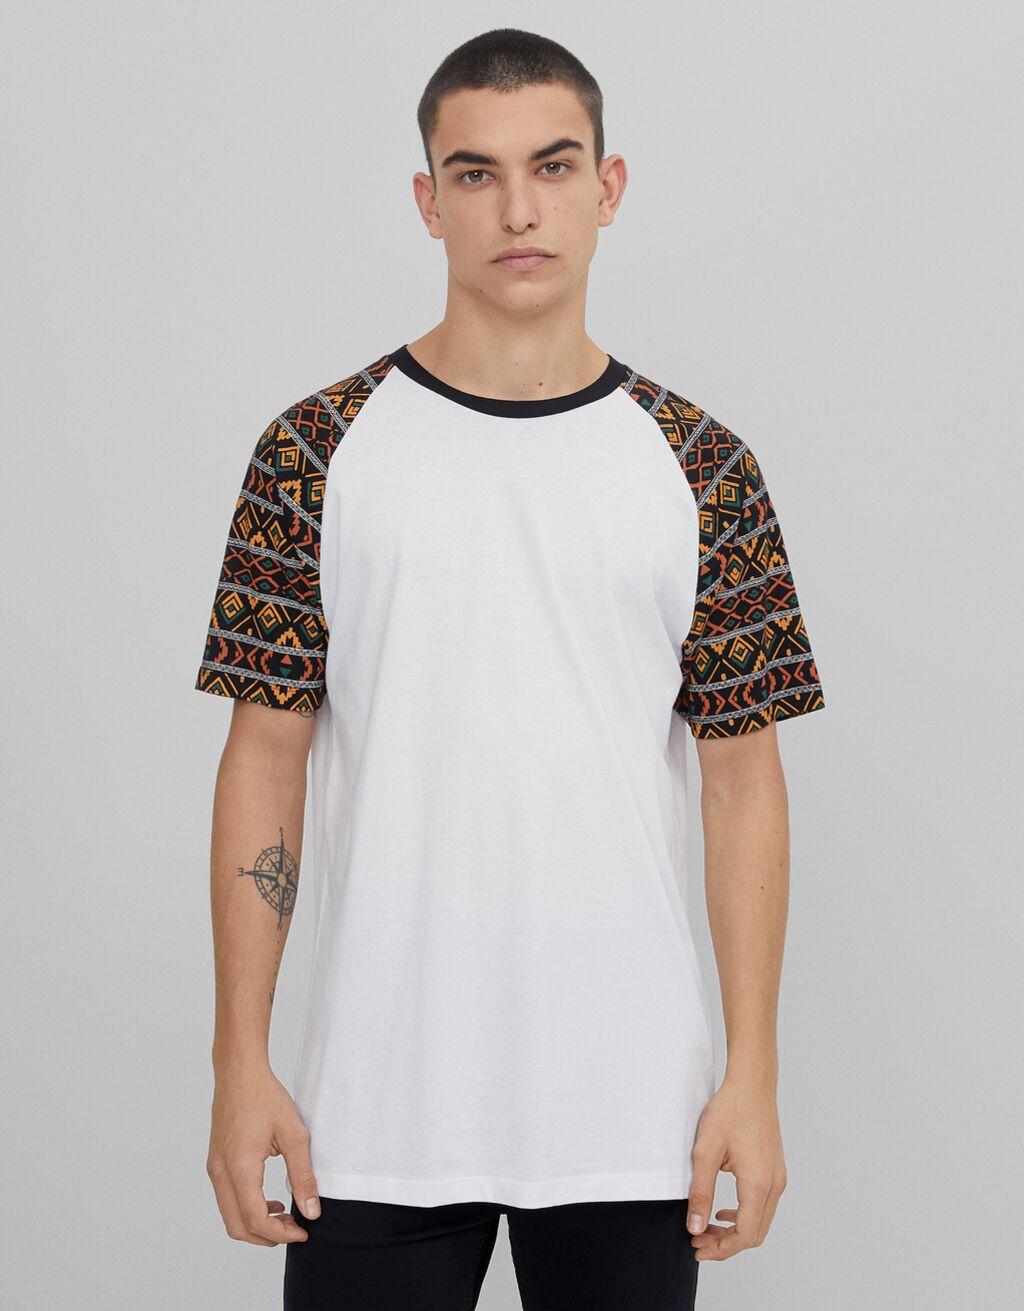 T-shirt with raglan sleeves